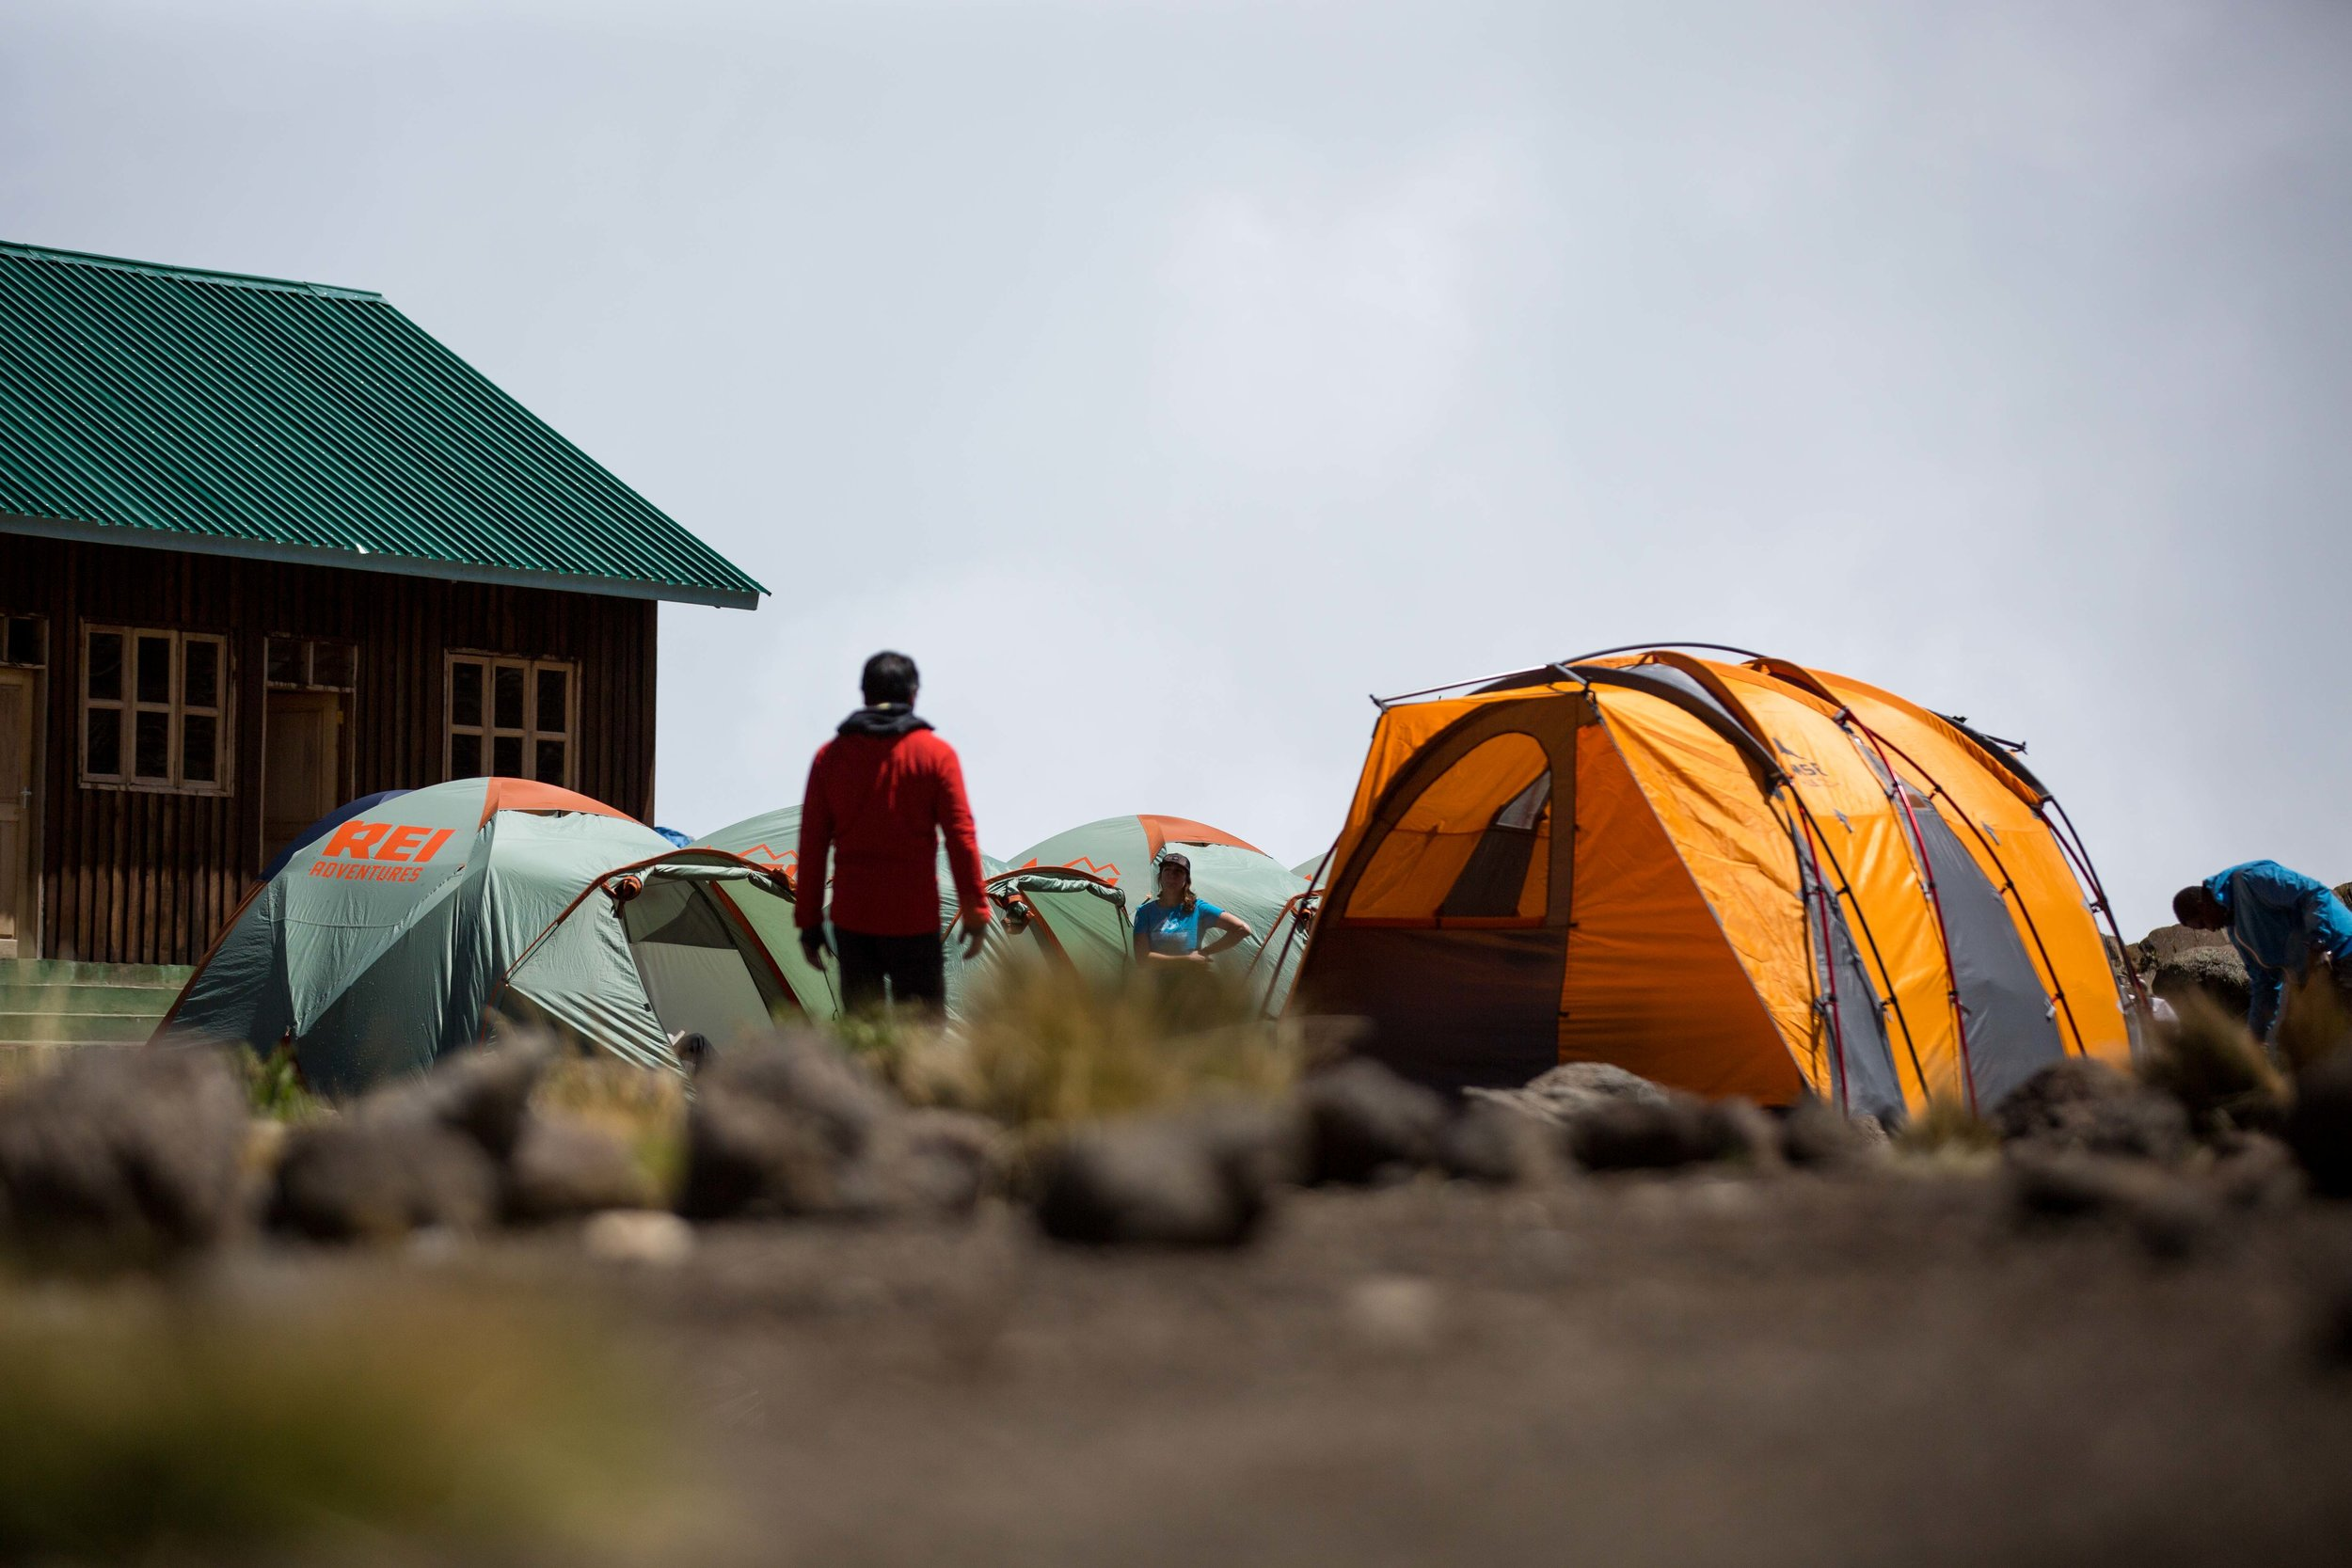 ajw_REI_Kilimanjaro-29.jpg